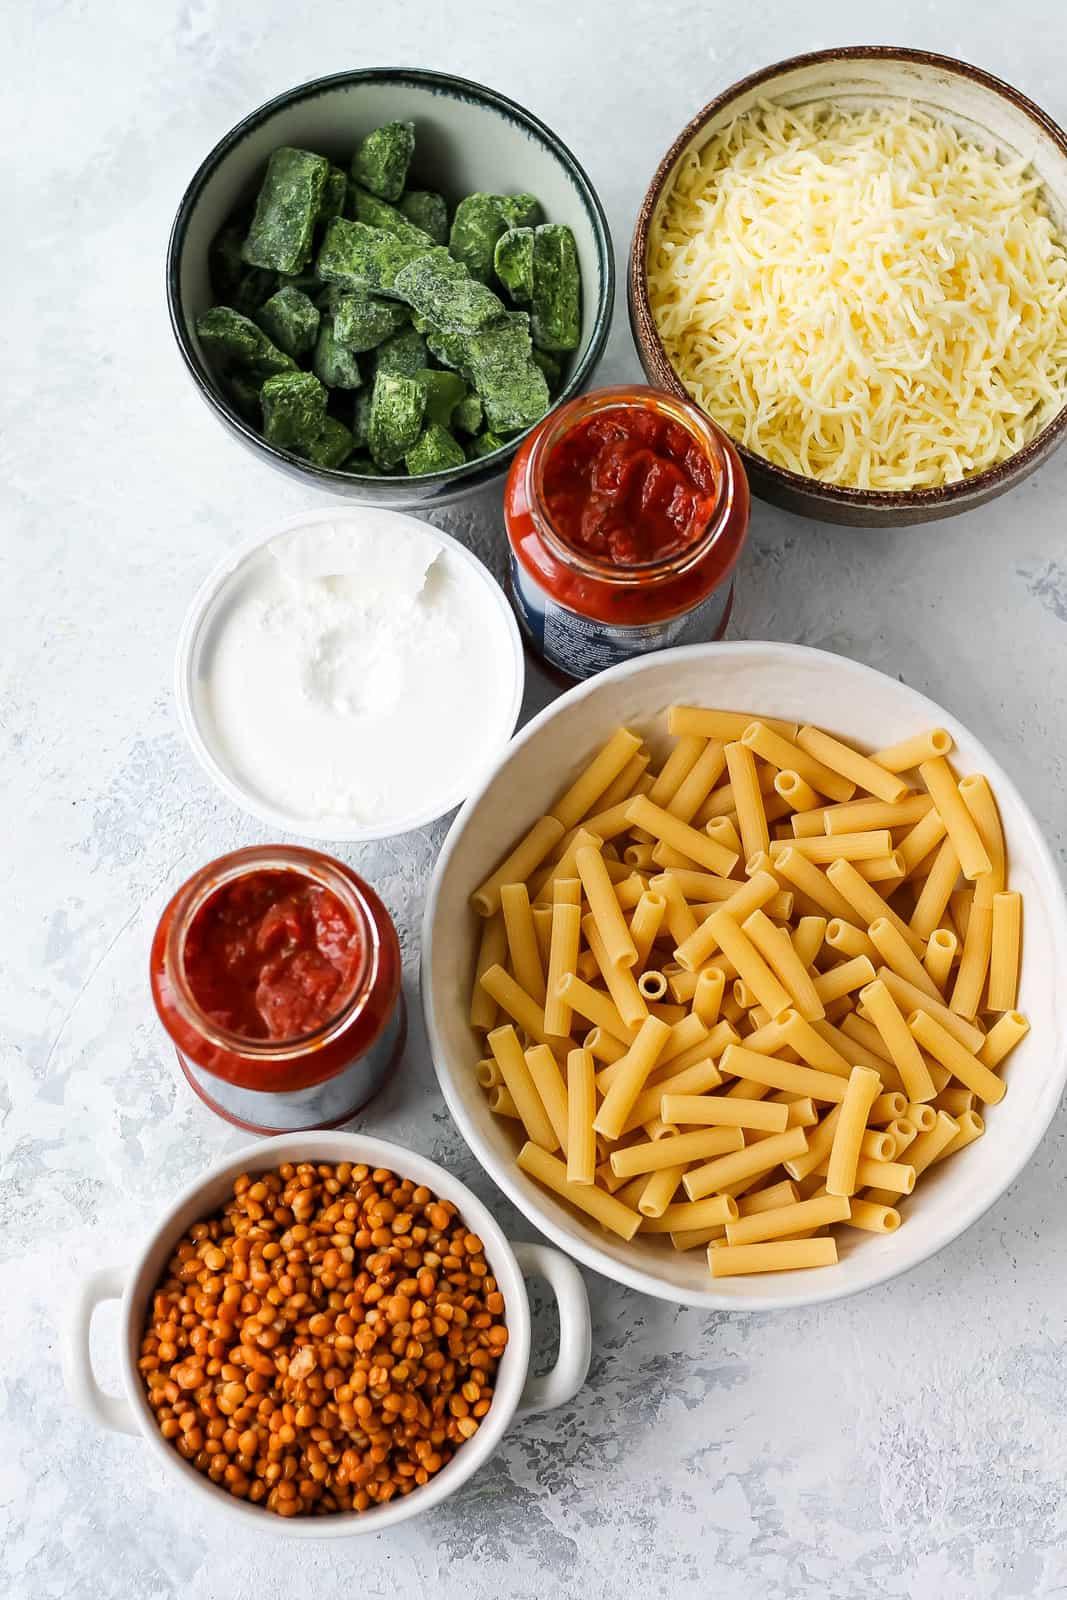 pasta, frozen spinach, mozzarella, ricotta, marinara sauce, and lentils on a grey background